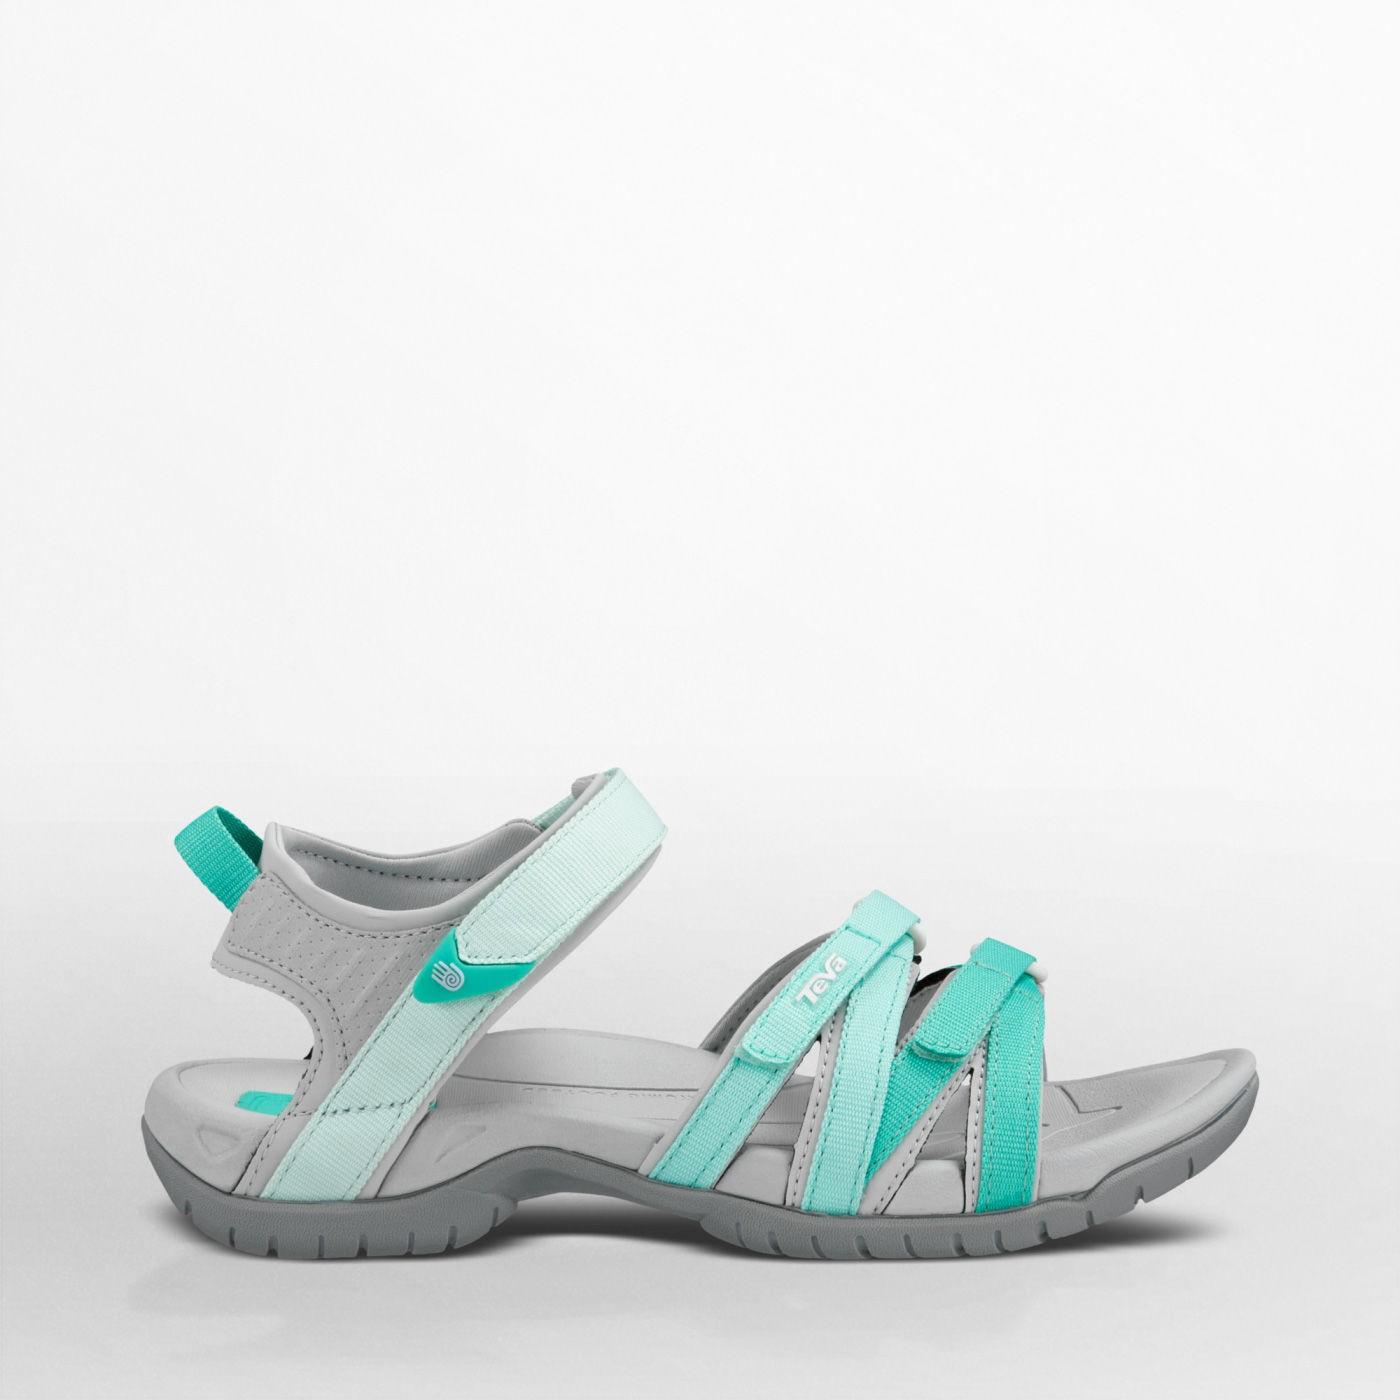 TEVA sandale femme voyage TIRRA WOMEN